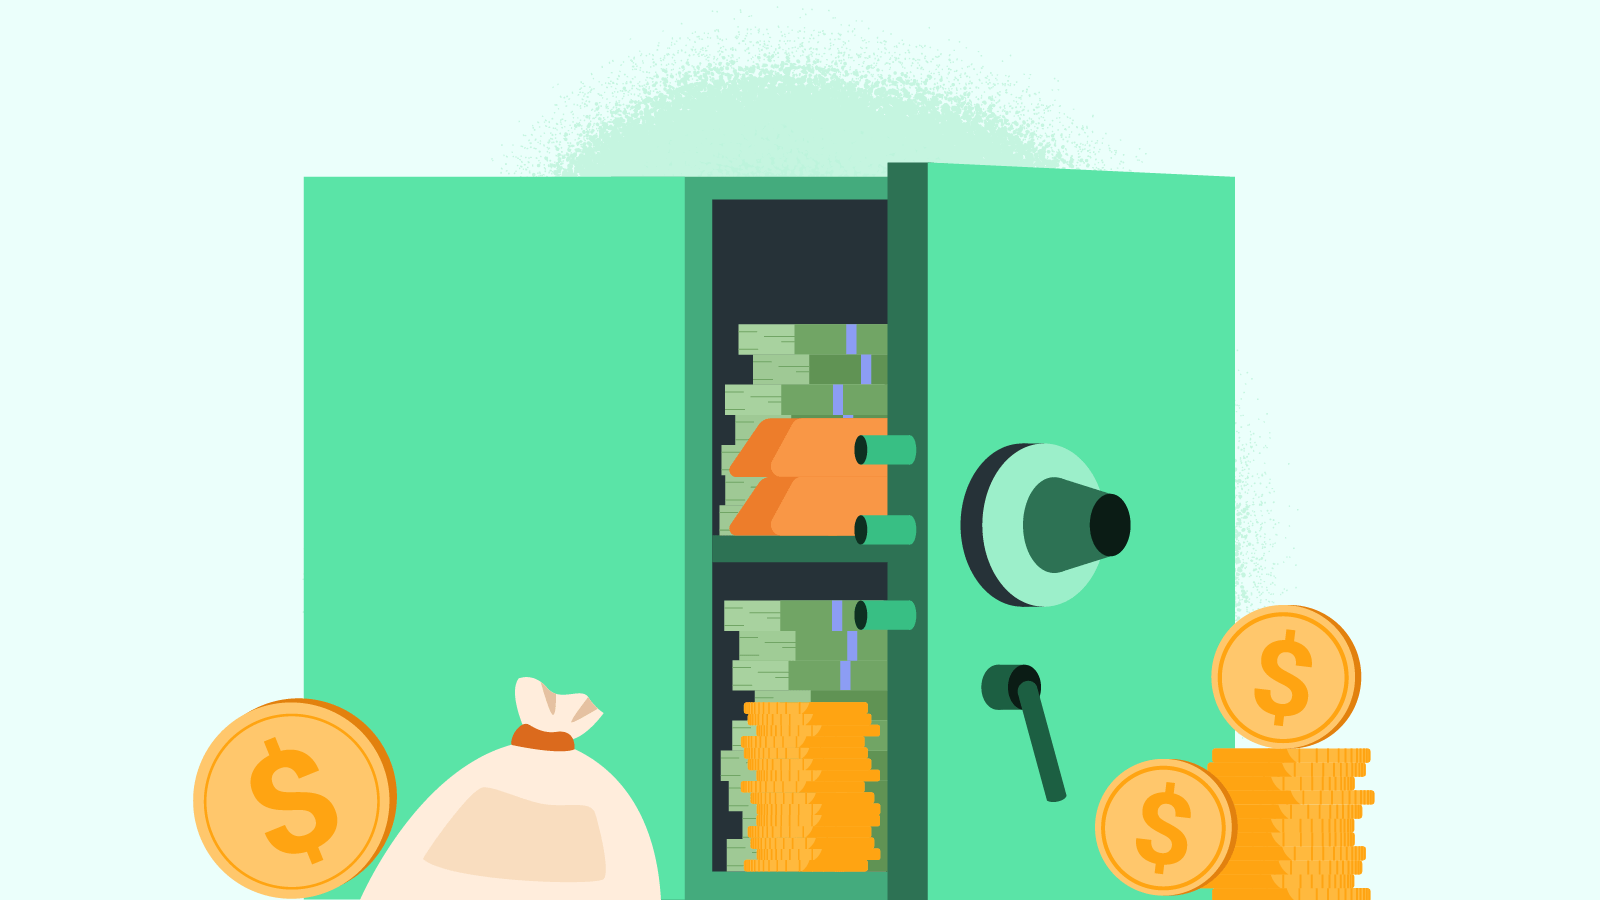 UKGC protects your money